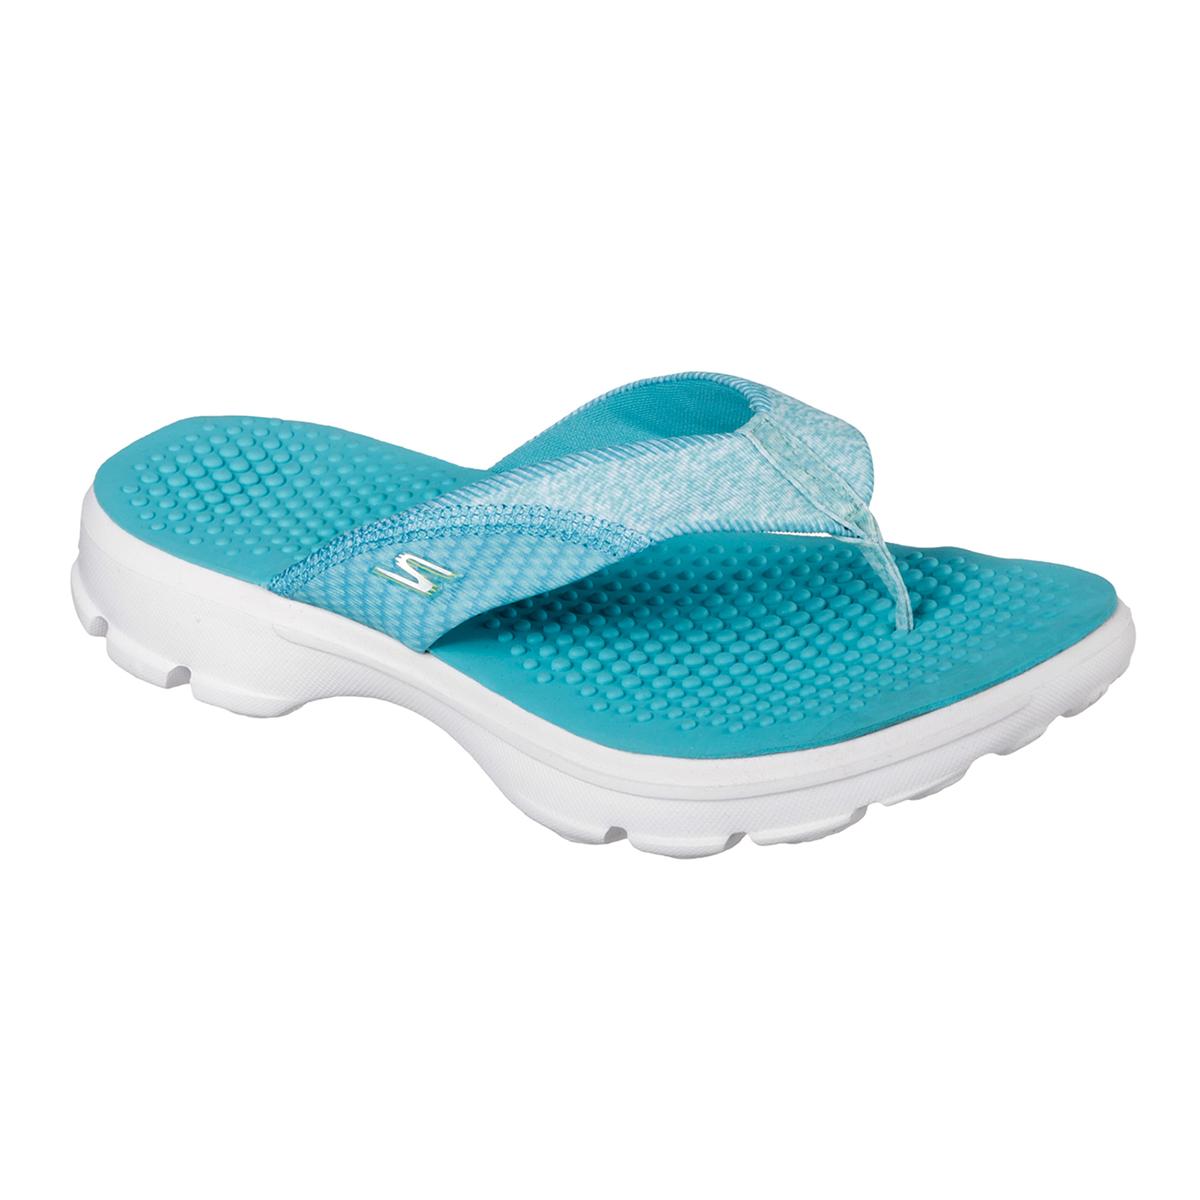 GOwalk 3 Pizazz Flip Flops